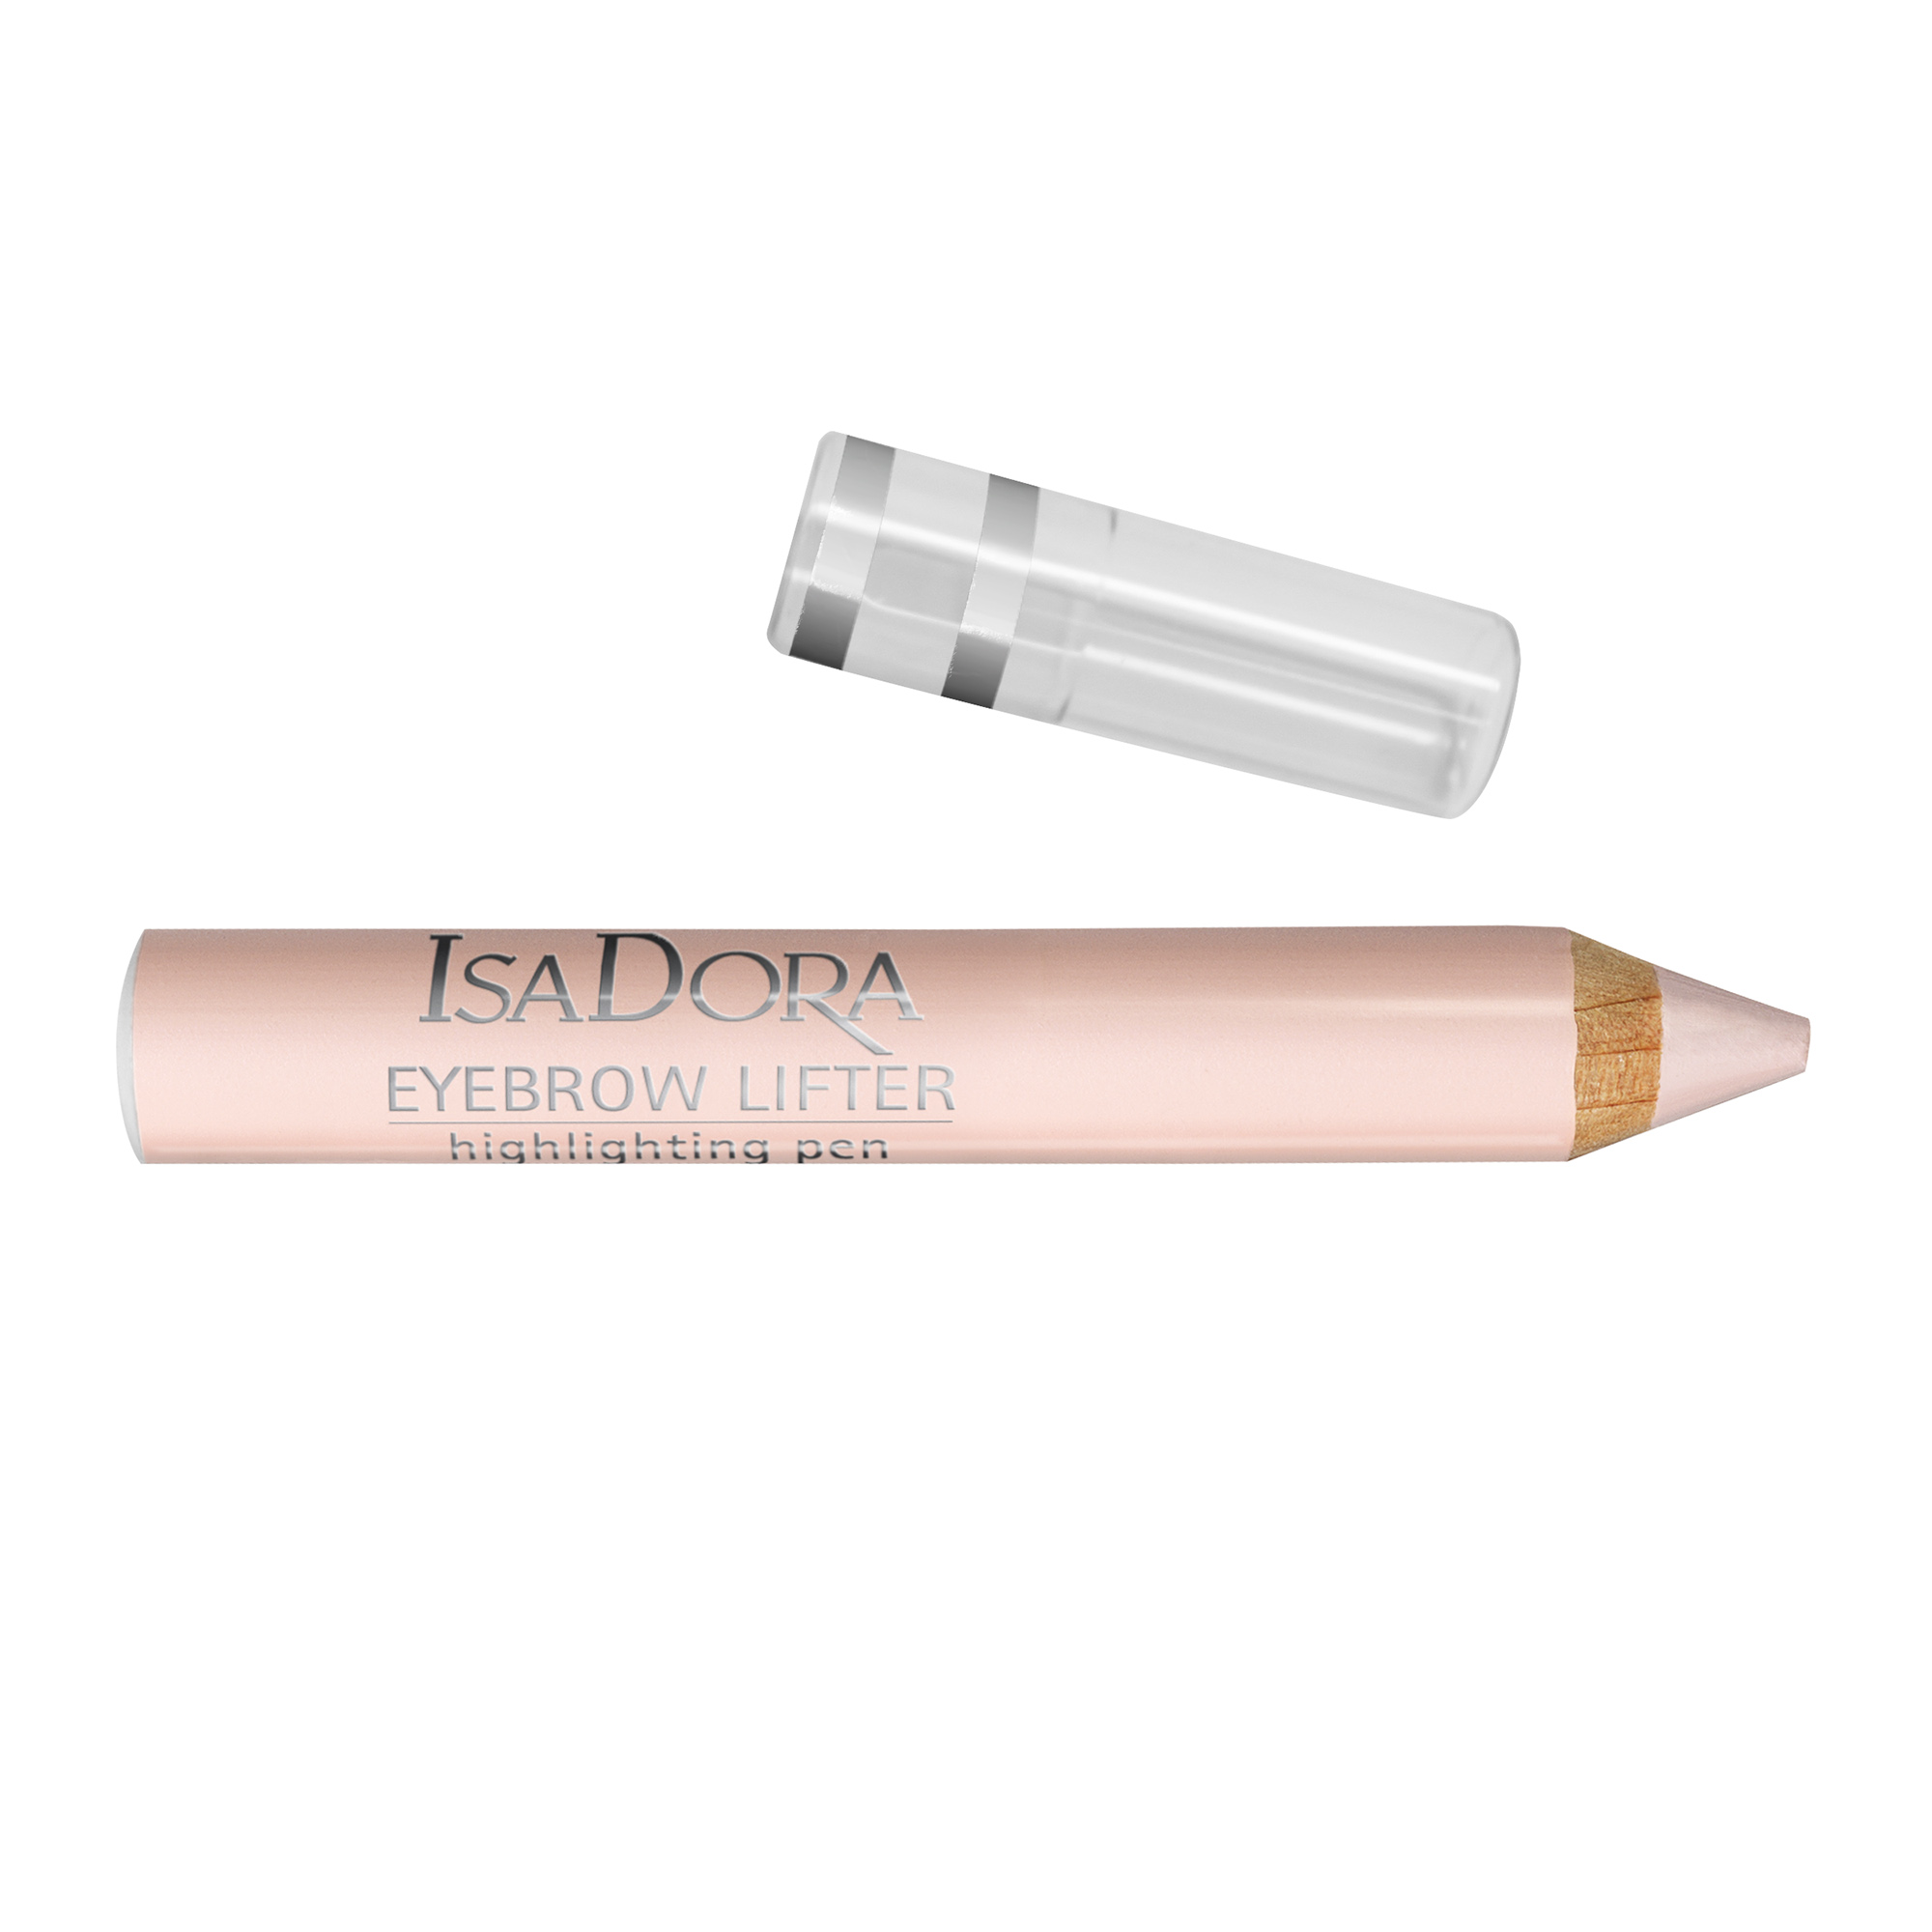 Eyebrow Lifter - Highlighting Pen